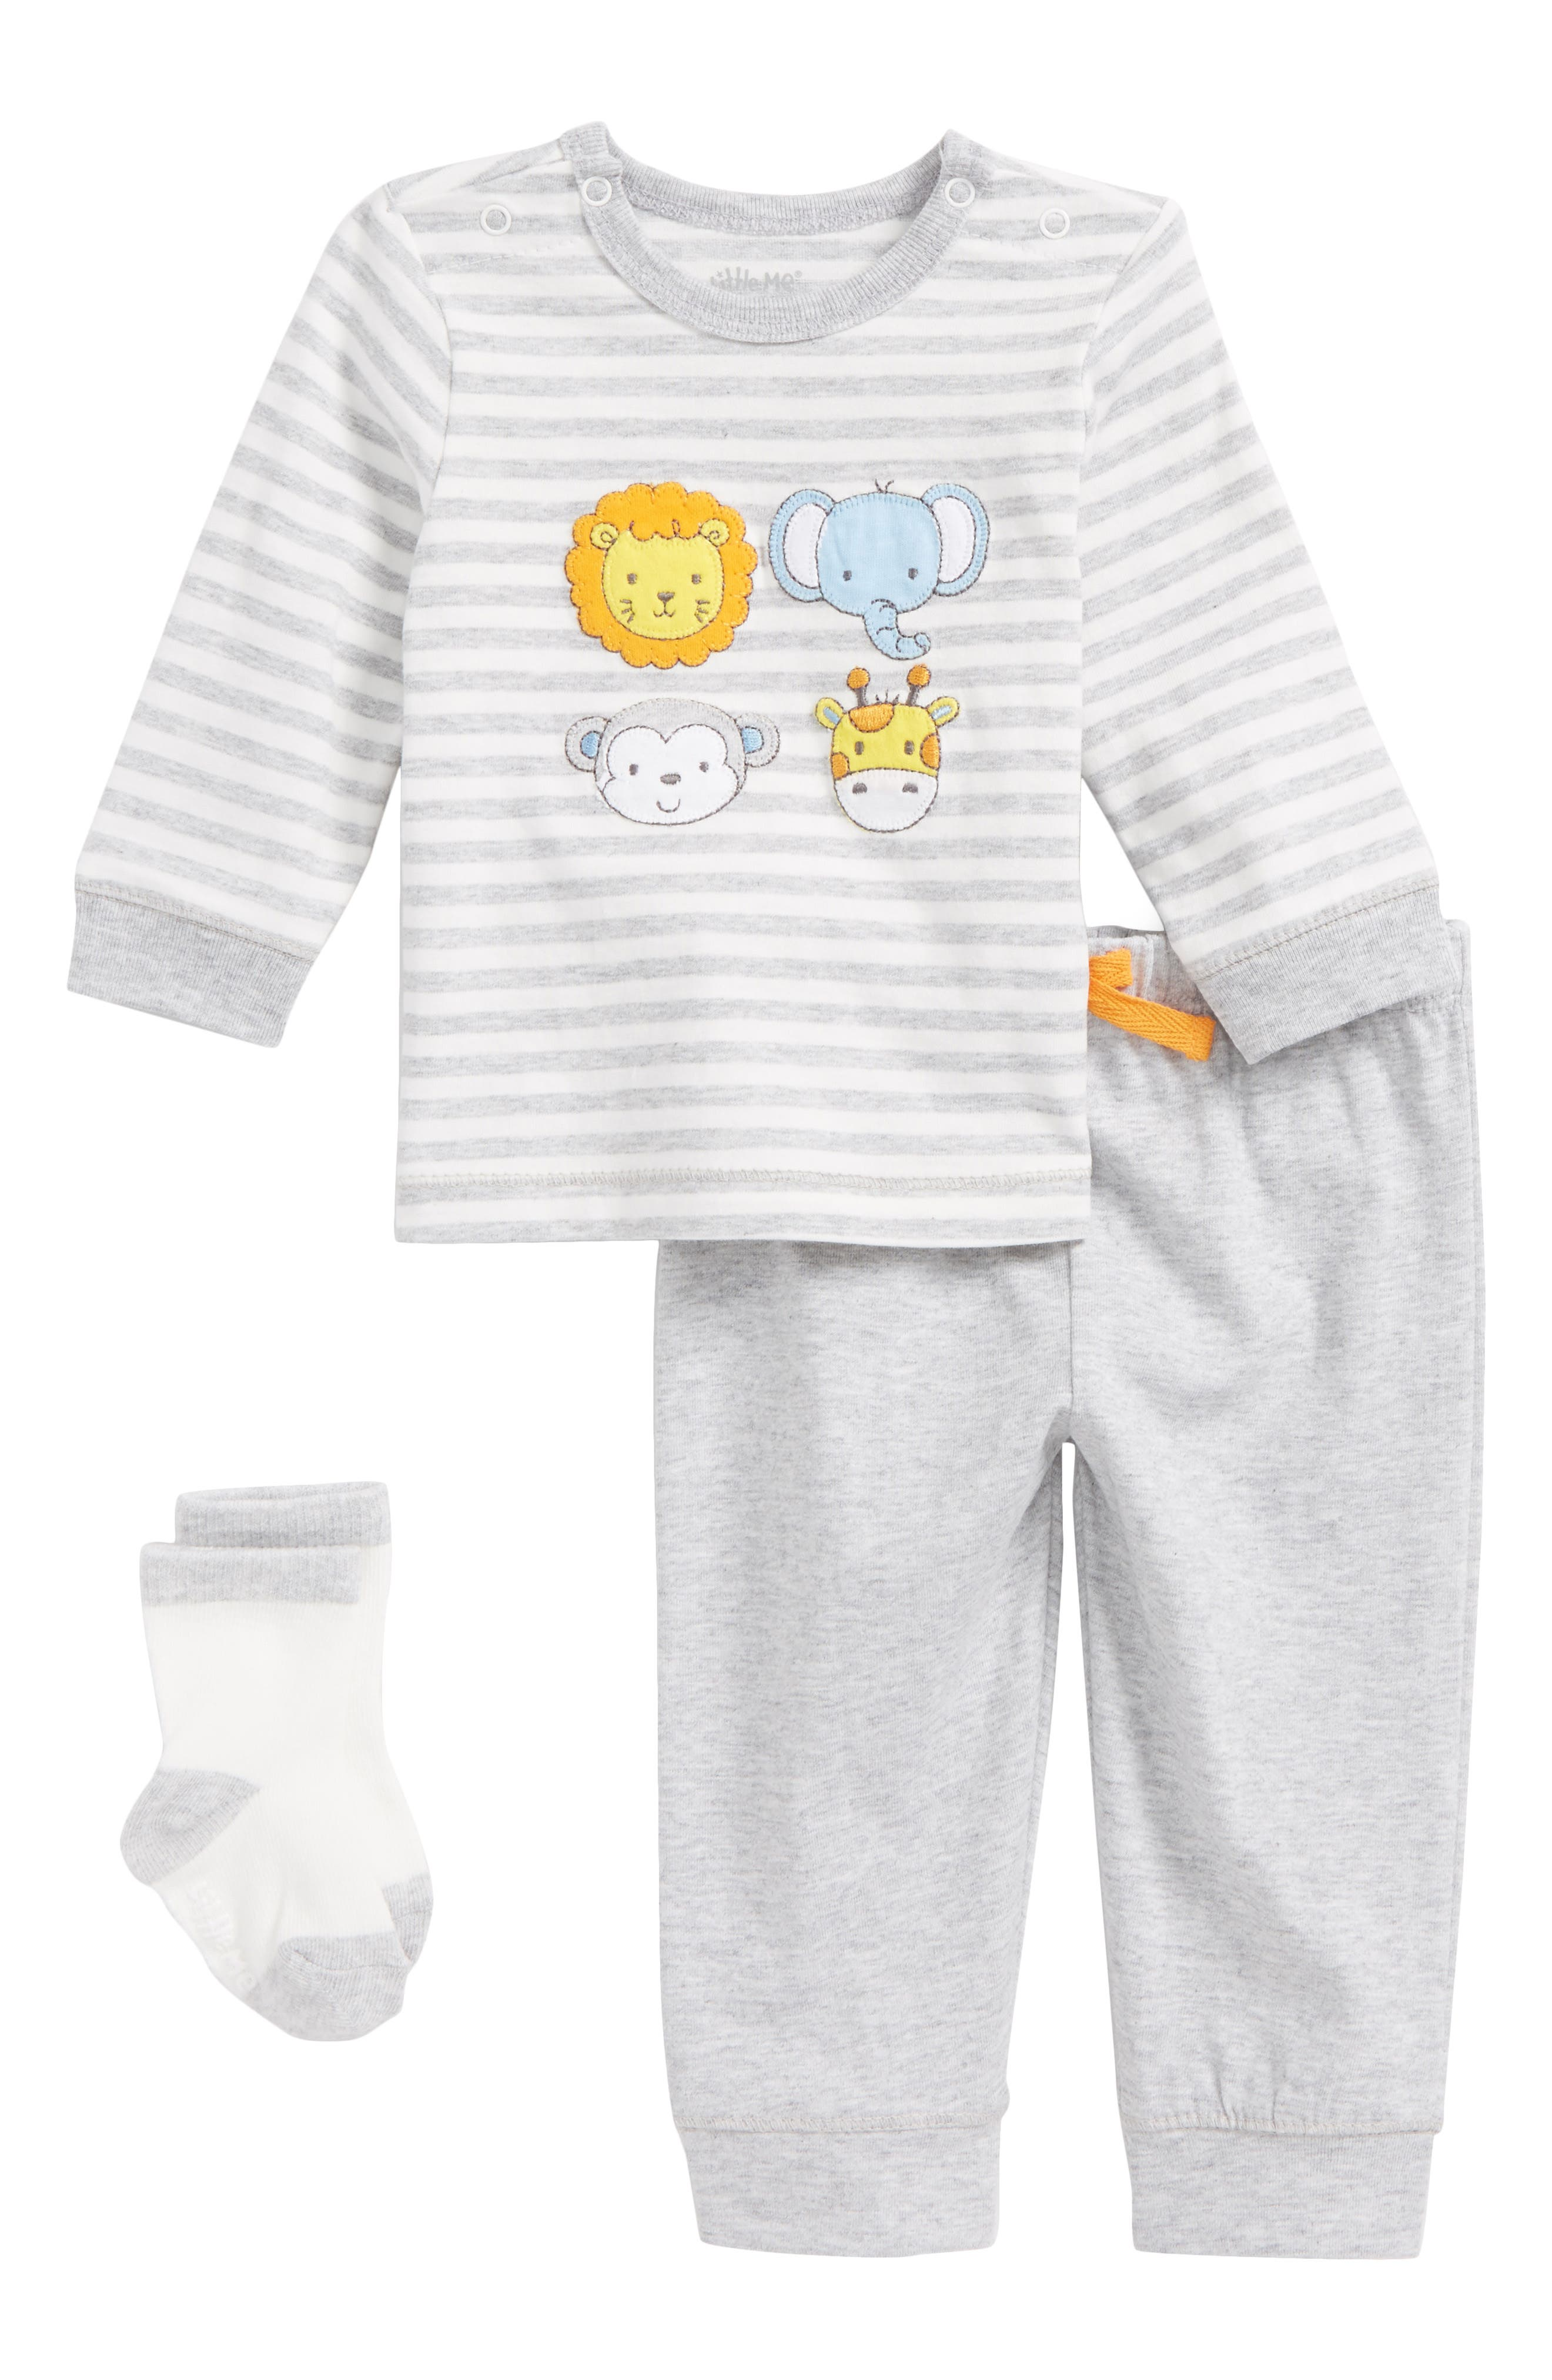 Alternate Image 1 Selected - Little Me Safari Pals T-Shirt, Jogger Pants & Socks Set (Baby)